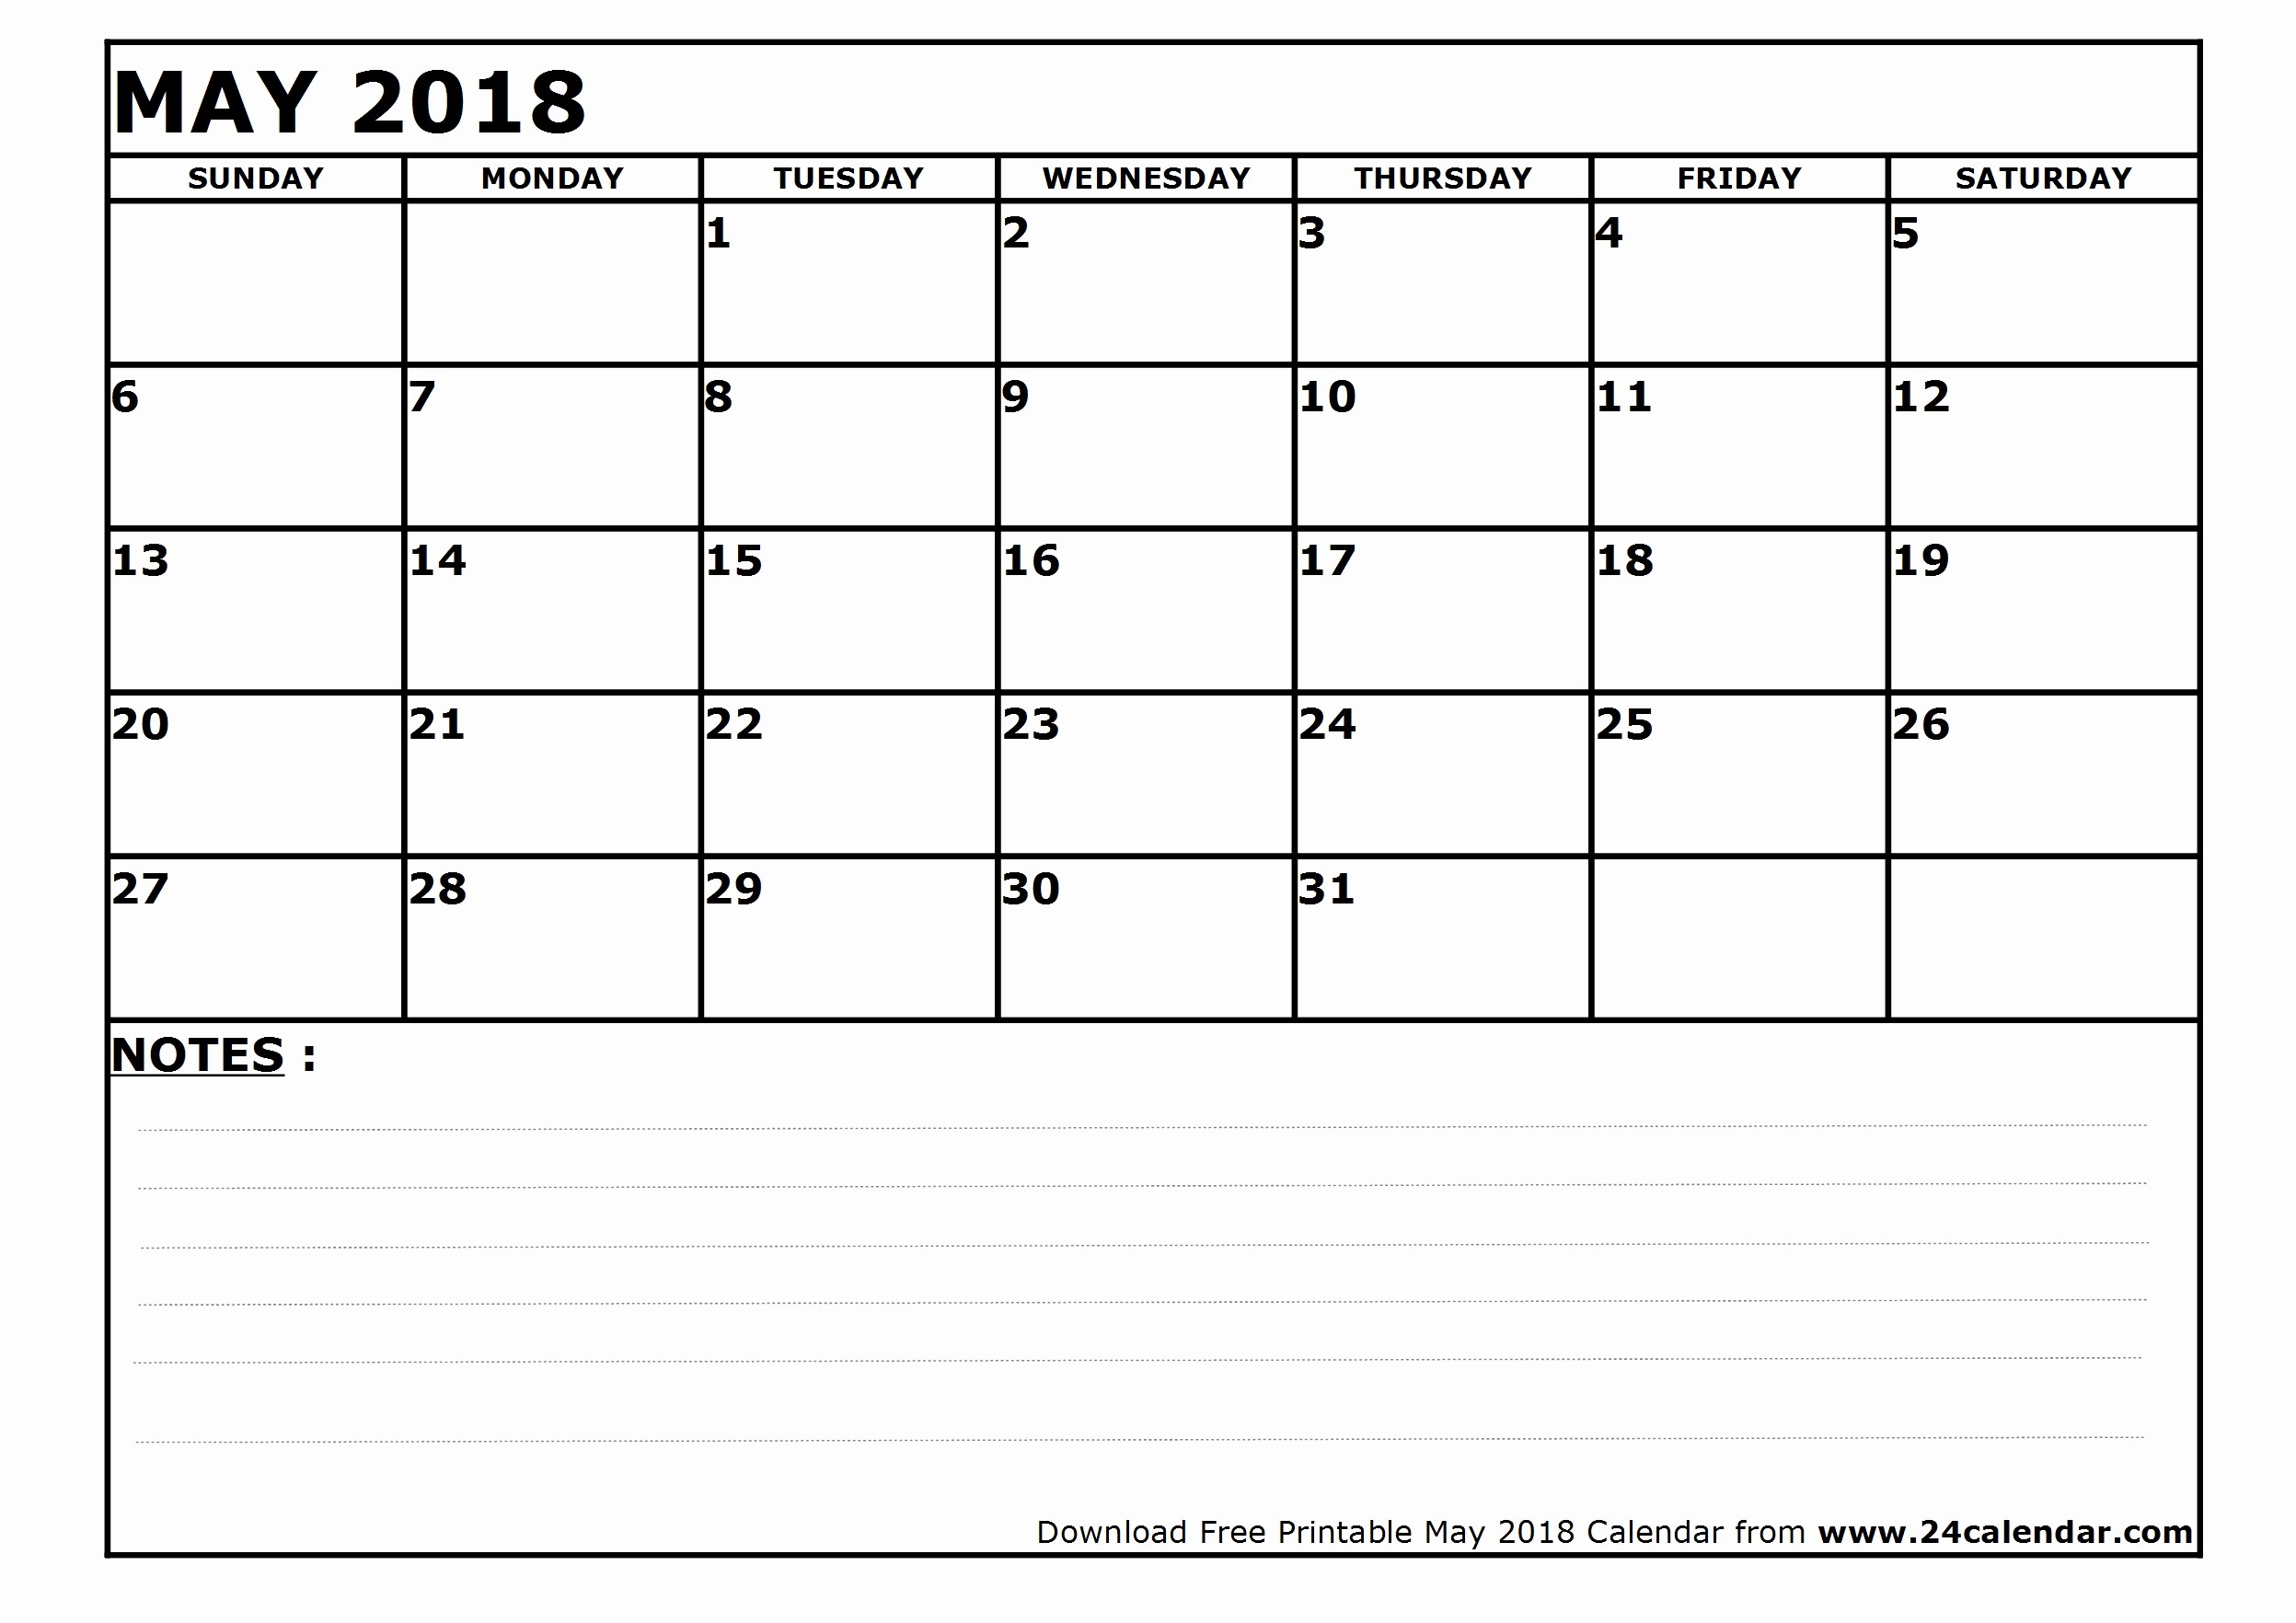 Blank May 2018 Calendar Printable Fresh Blank May 2018 Calendar In Printable format